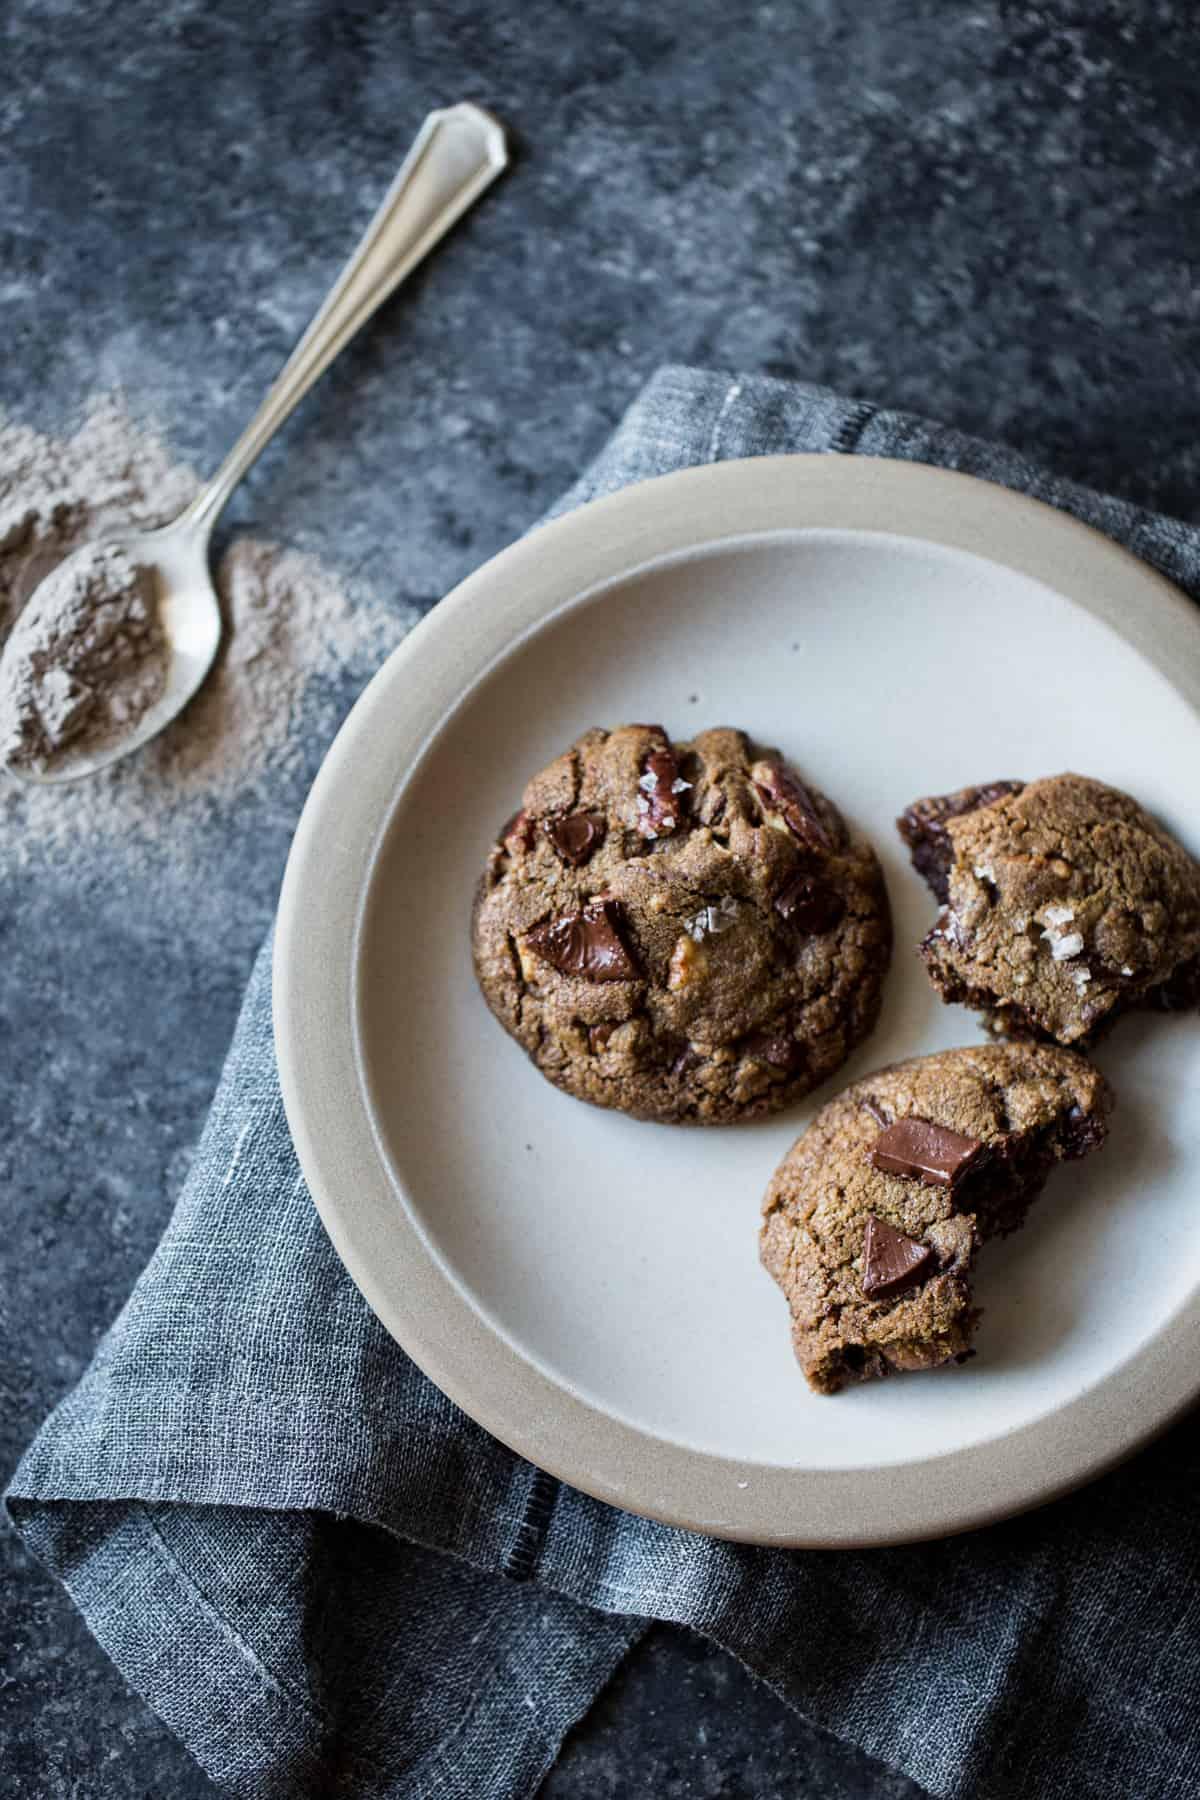 Gluten-Free Chocolate Chip Cookies Four Ways: Oat, Teff, Buckwheat, Mesquite